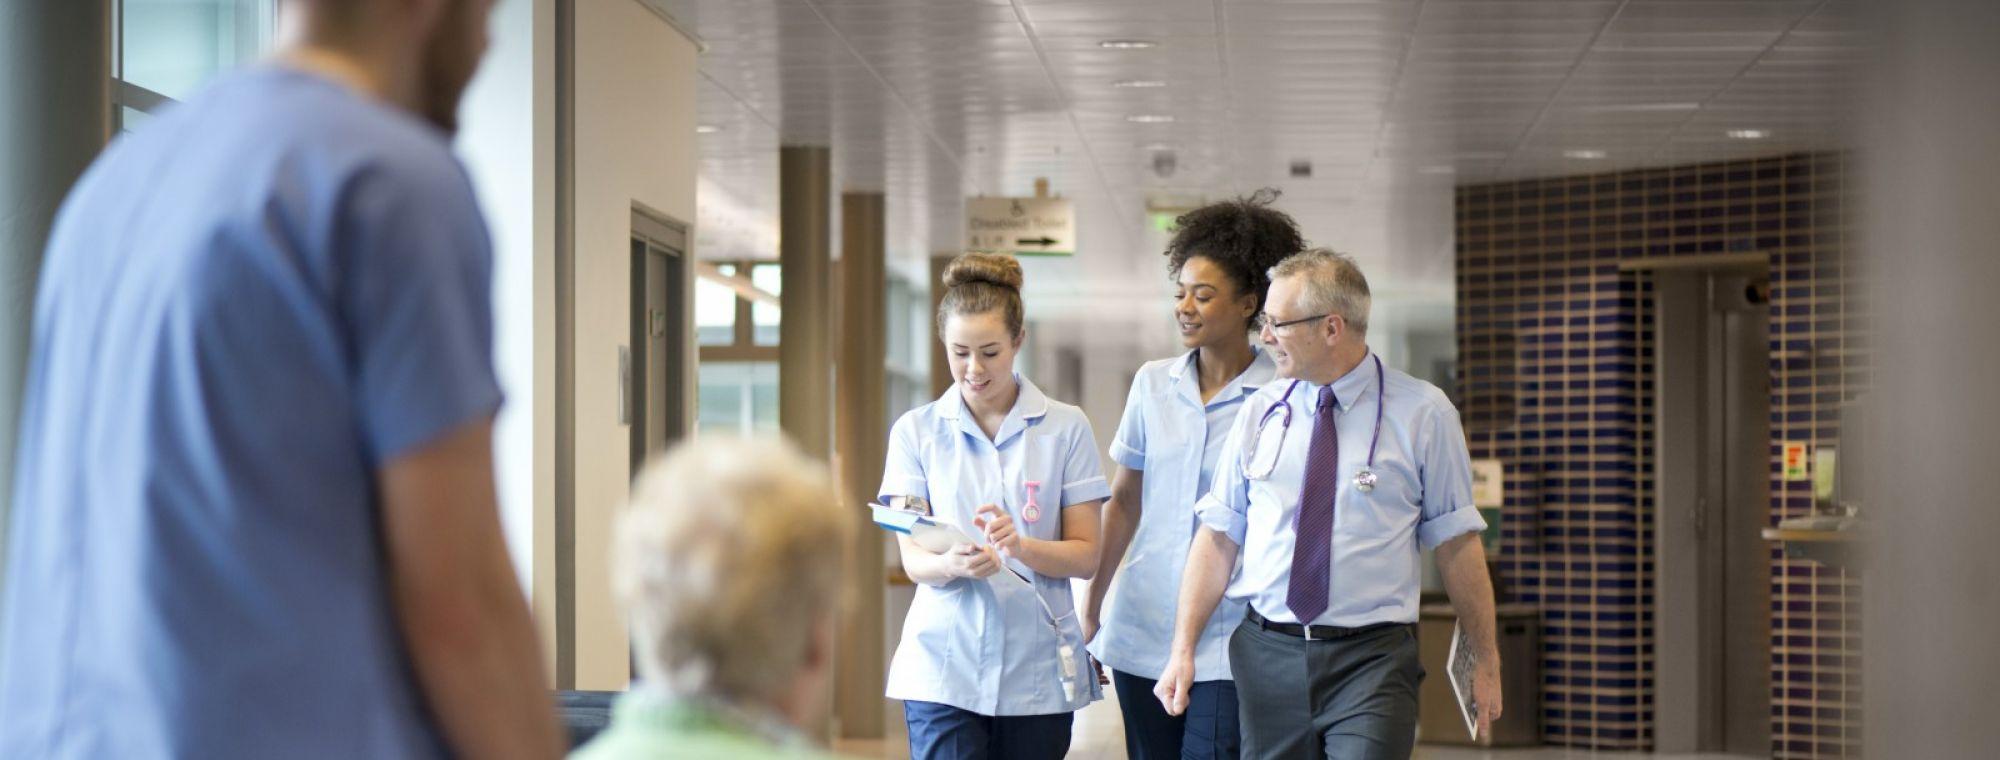 medical team walking in hallway